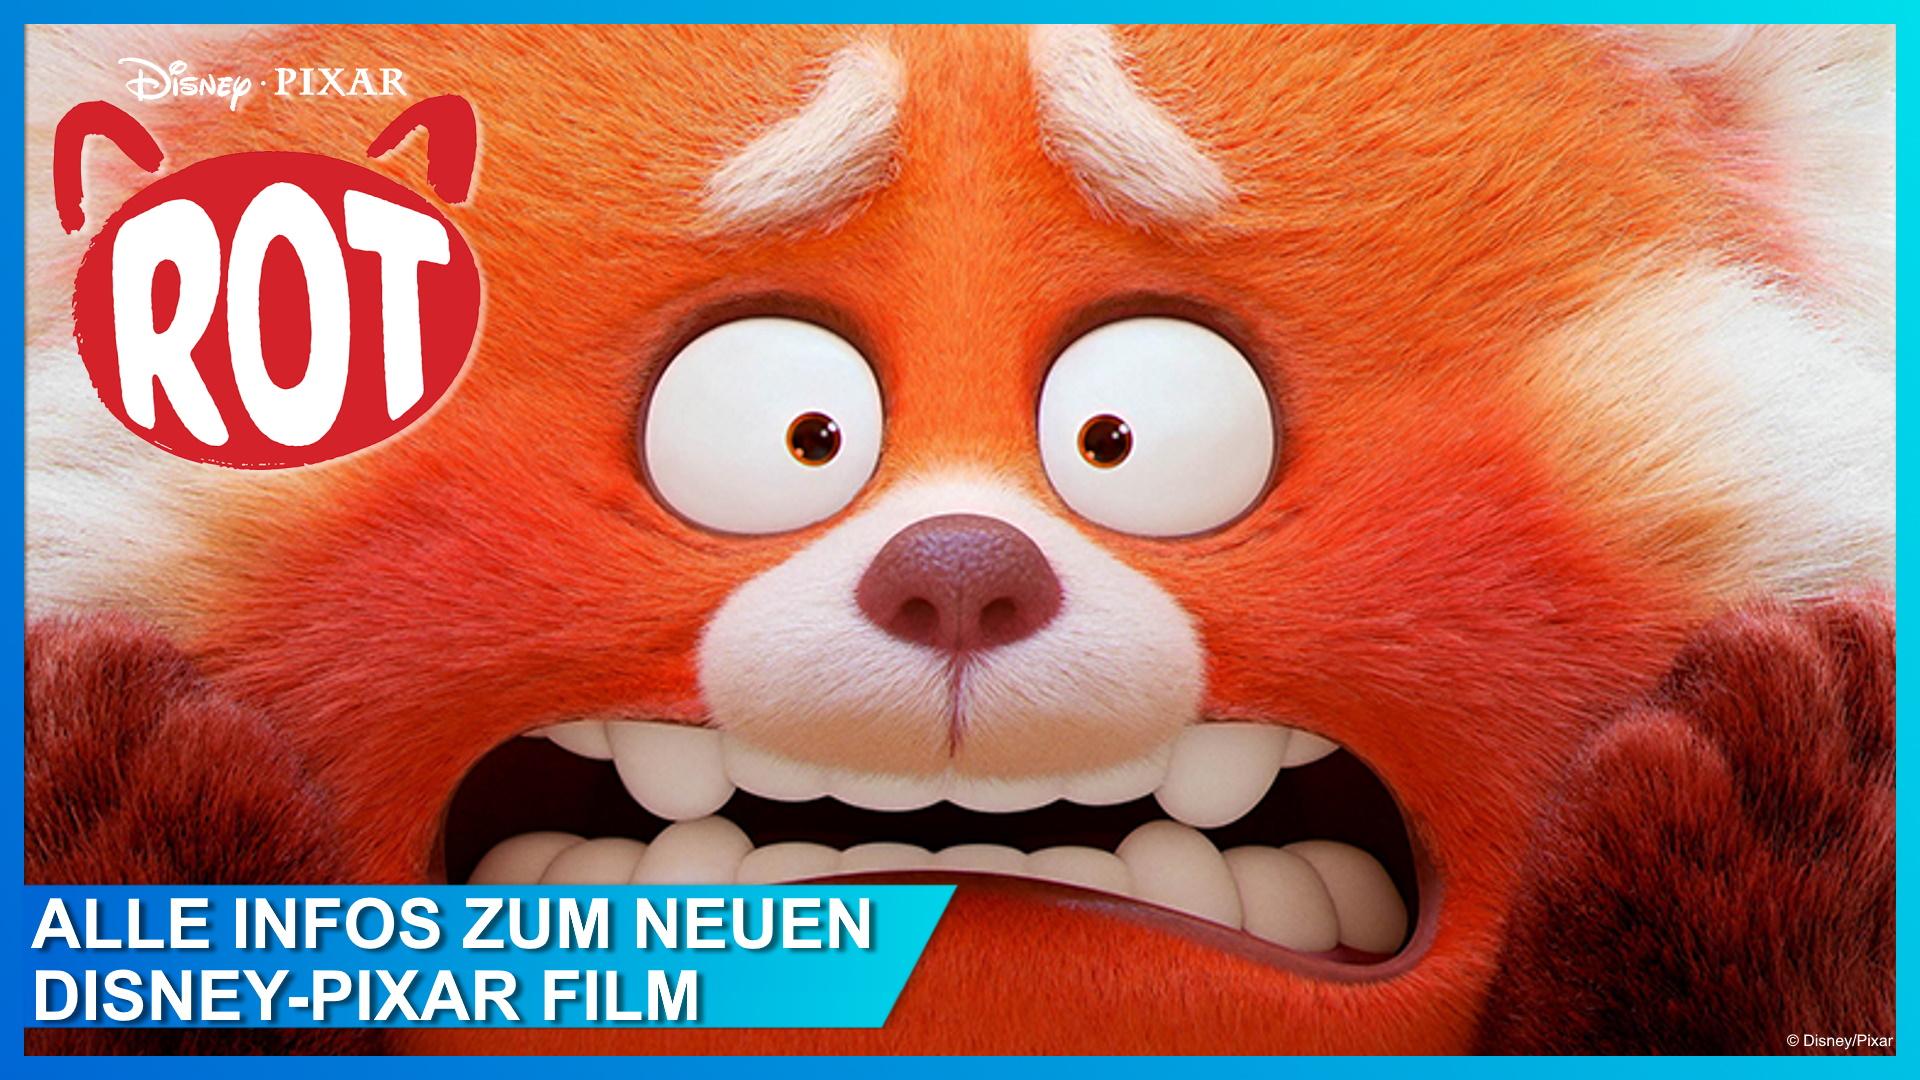 Disney-Pixar ROT